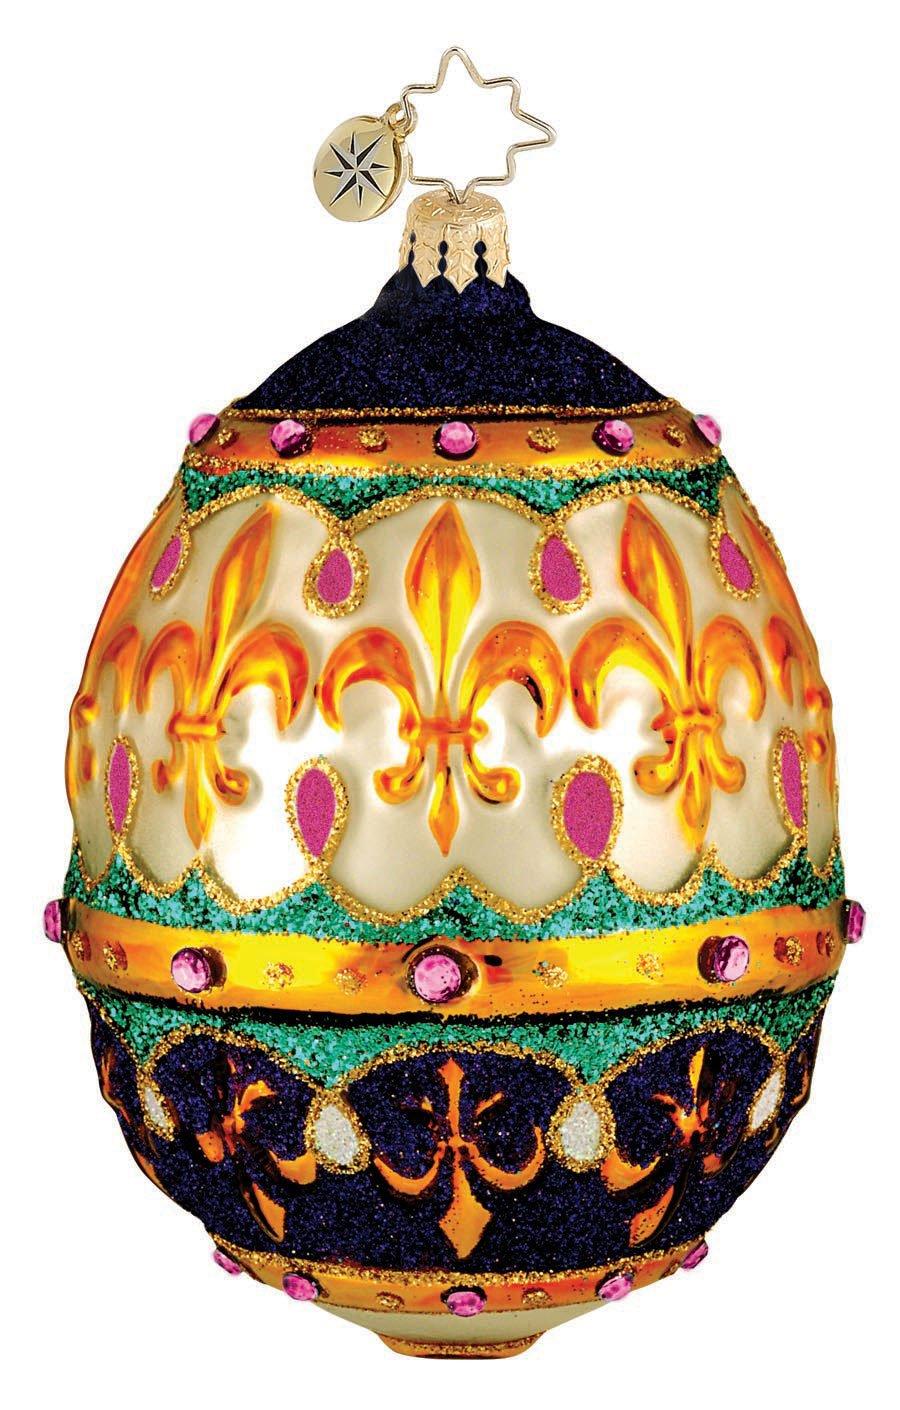 BEJEWELED Egg Purple Easter Glass Ornament